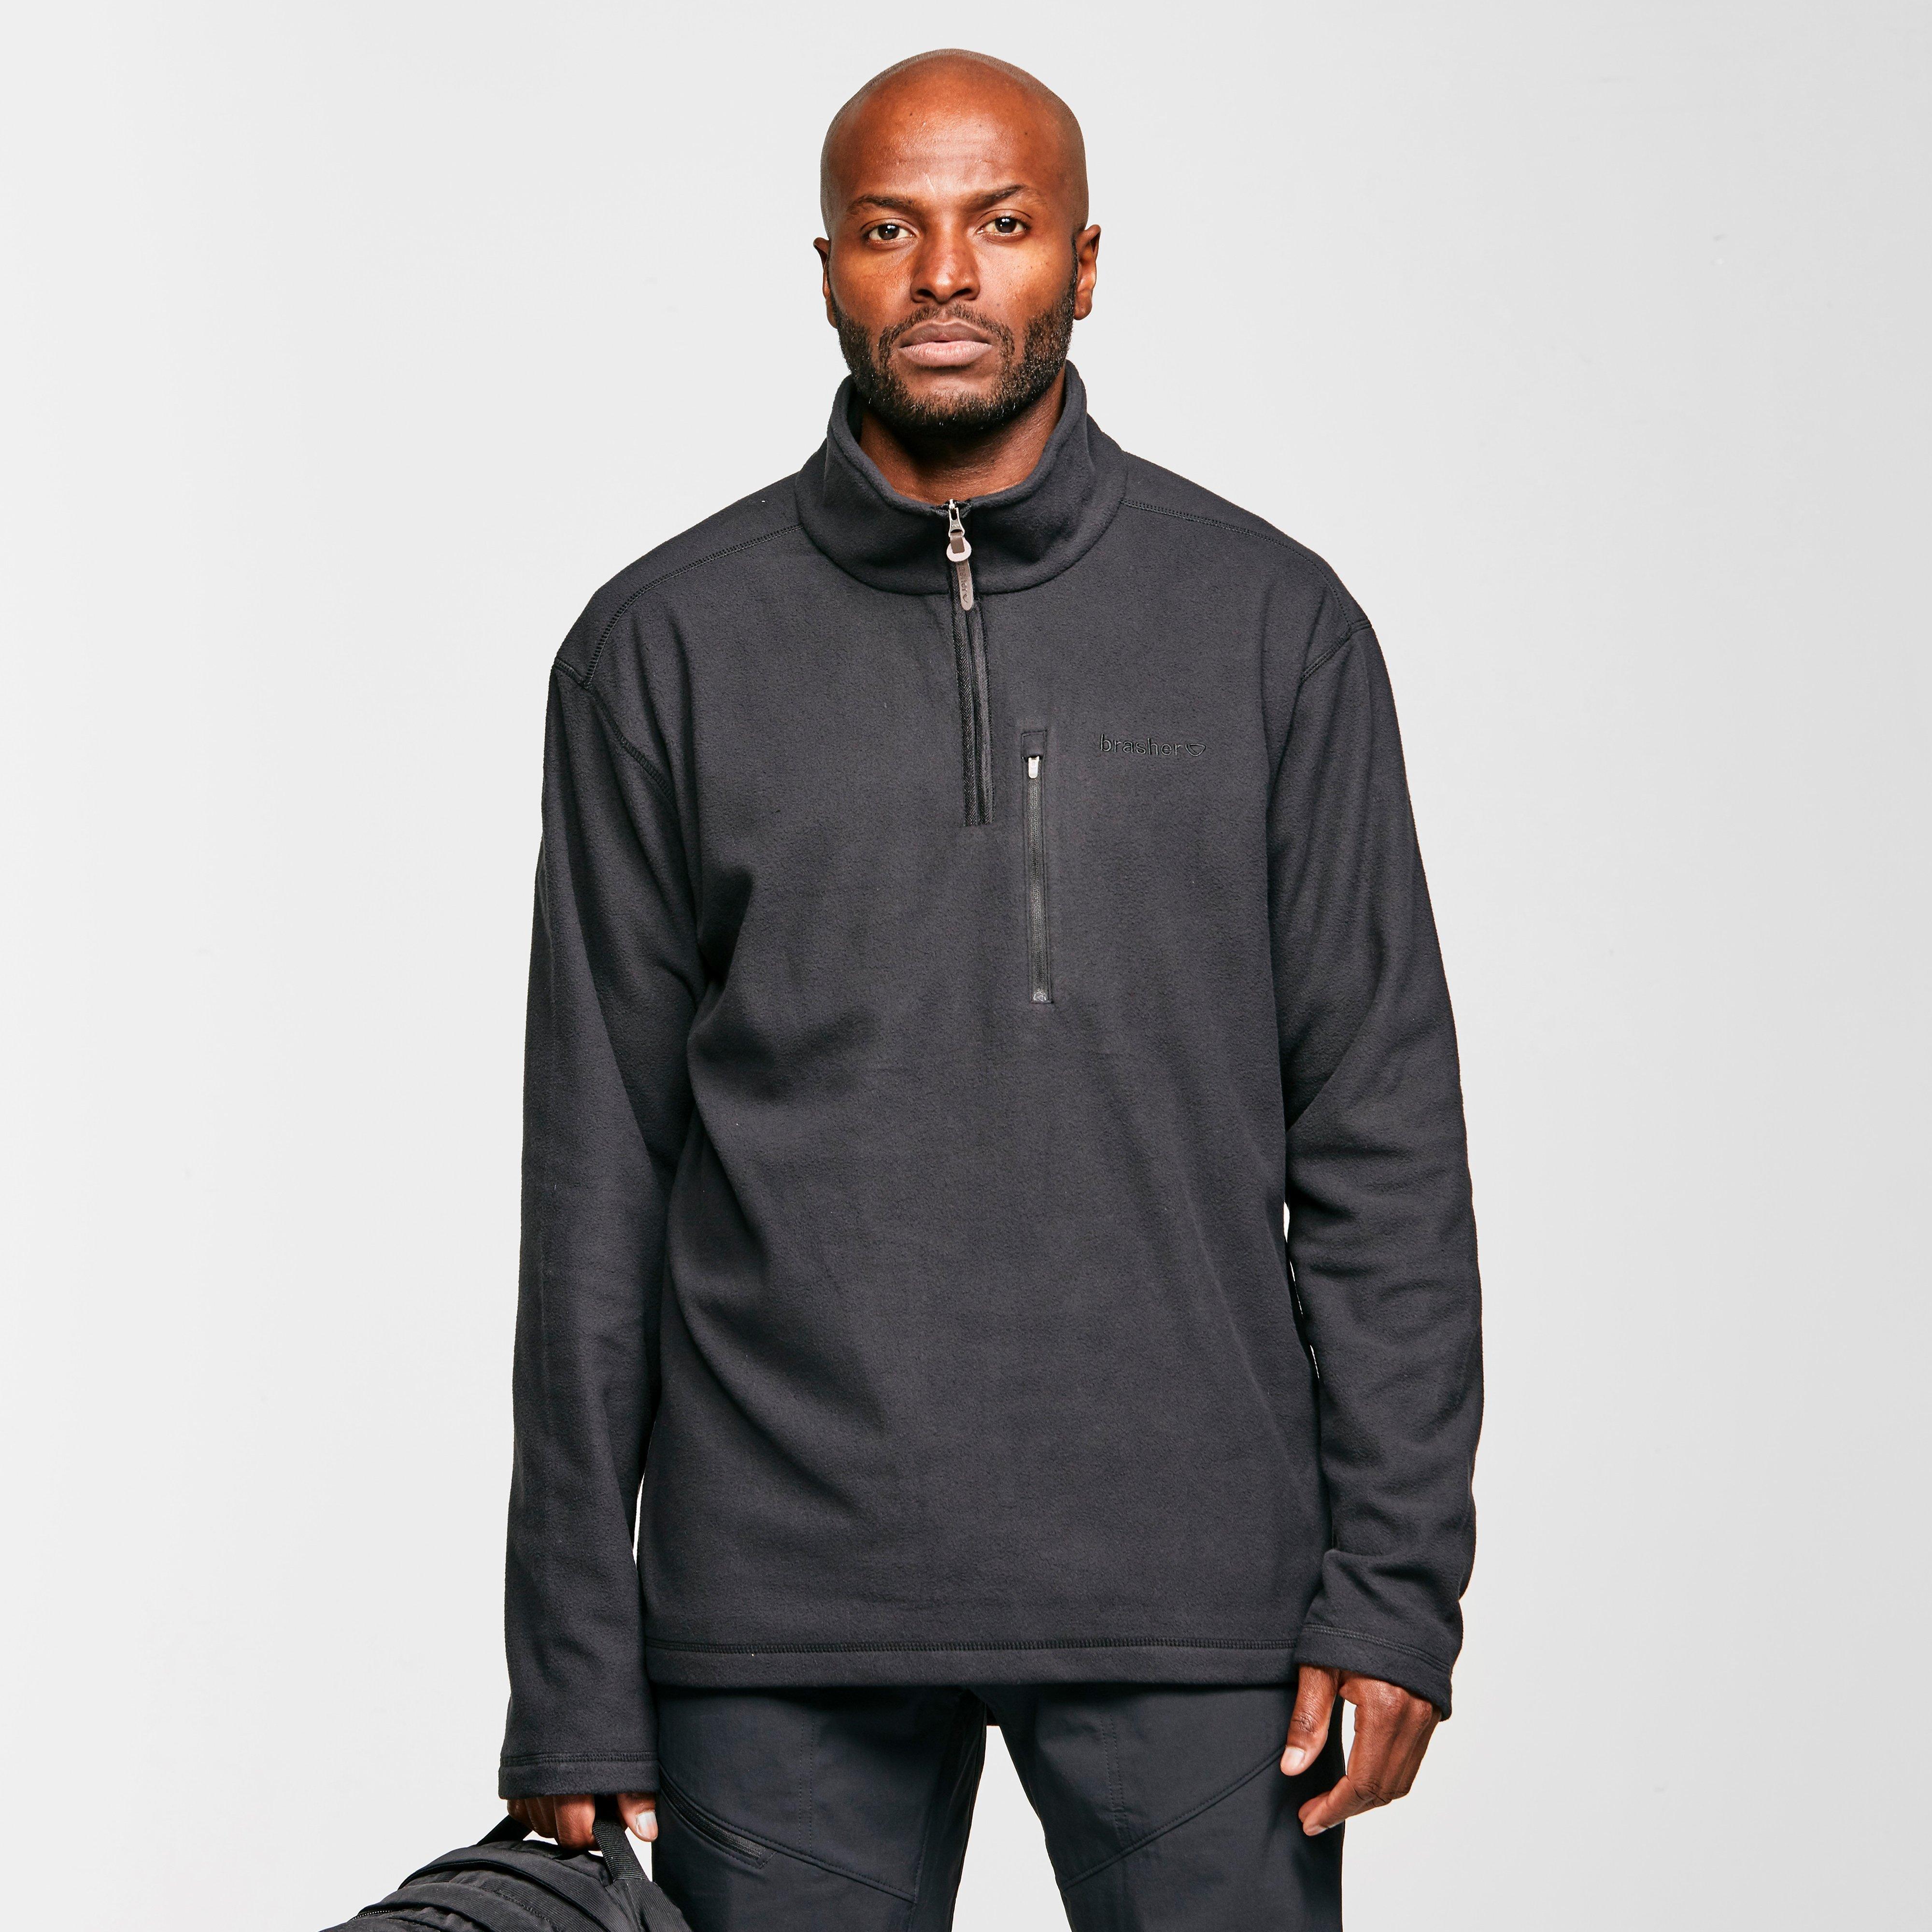 Brasher Mens Bleaberry Half-zip Fleece - Black/blk  Black/blk